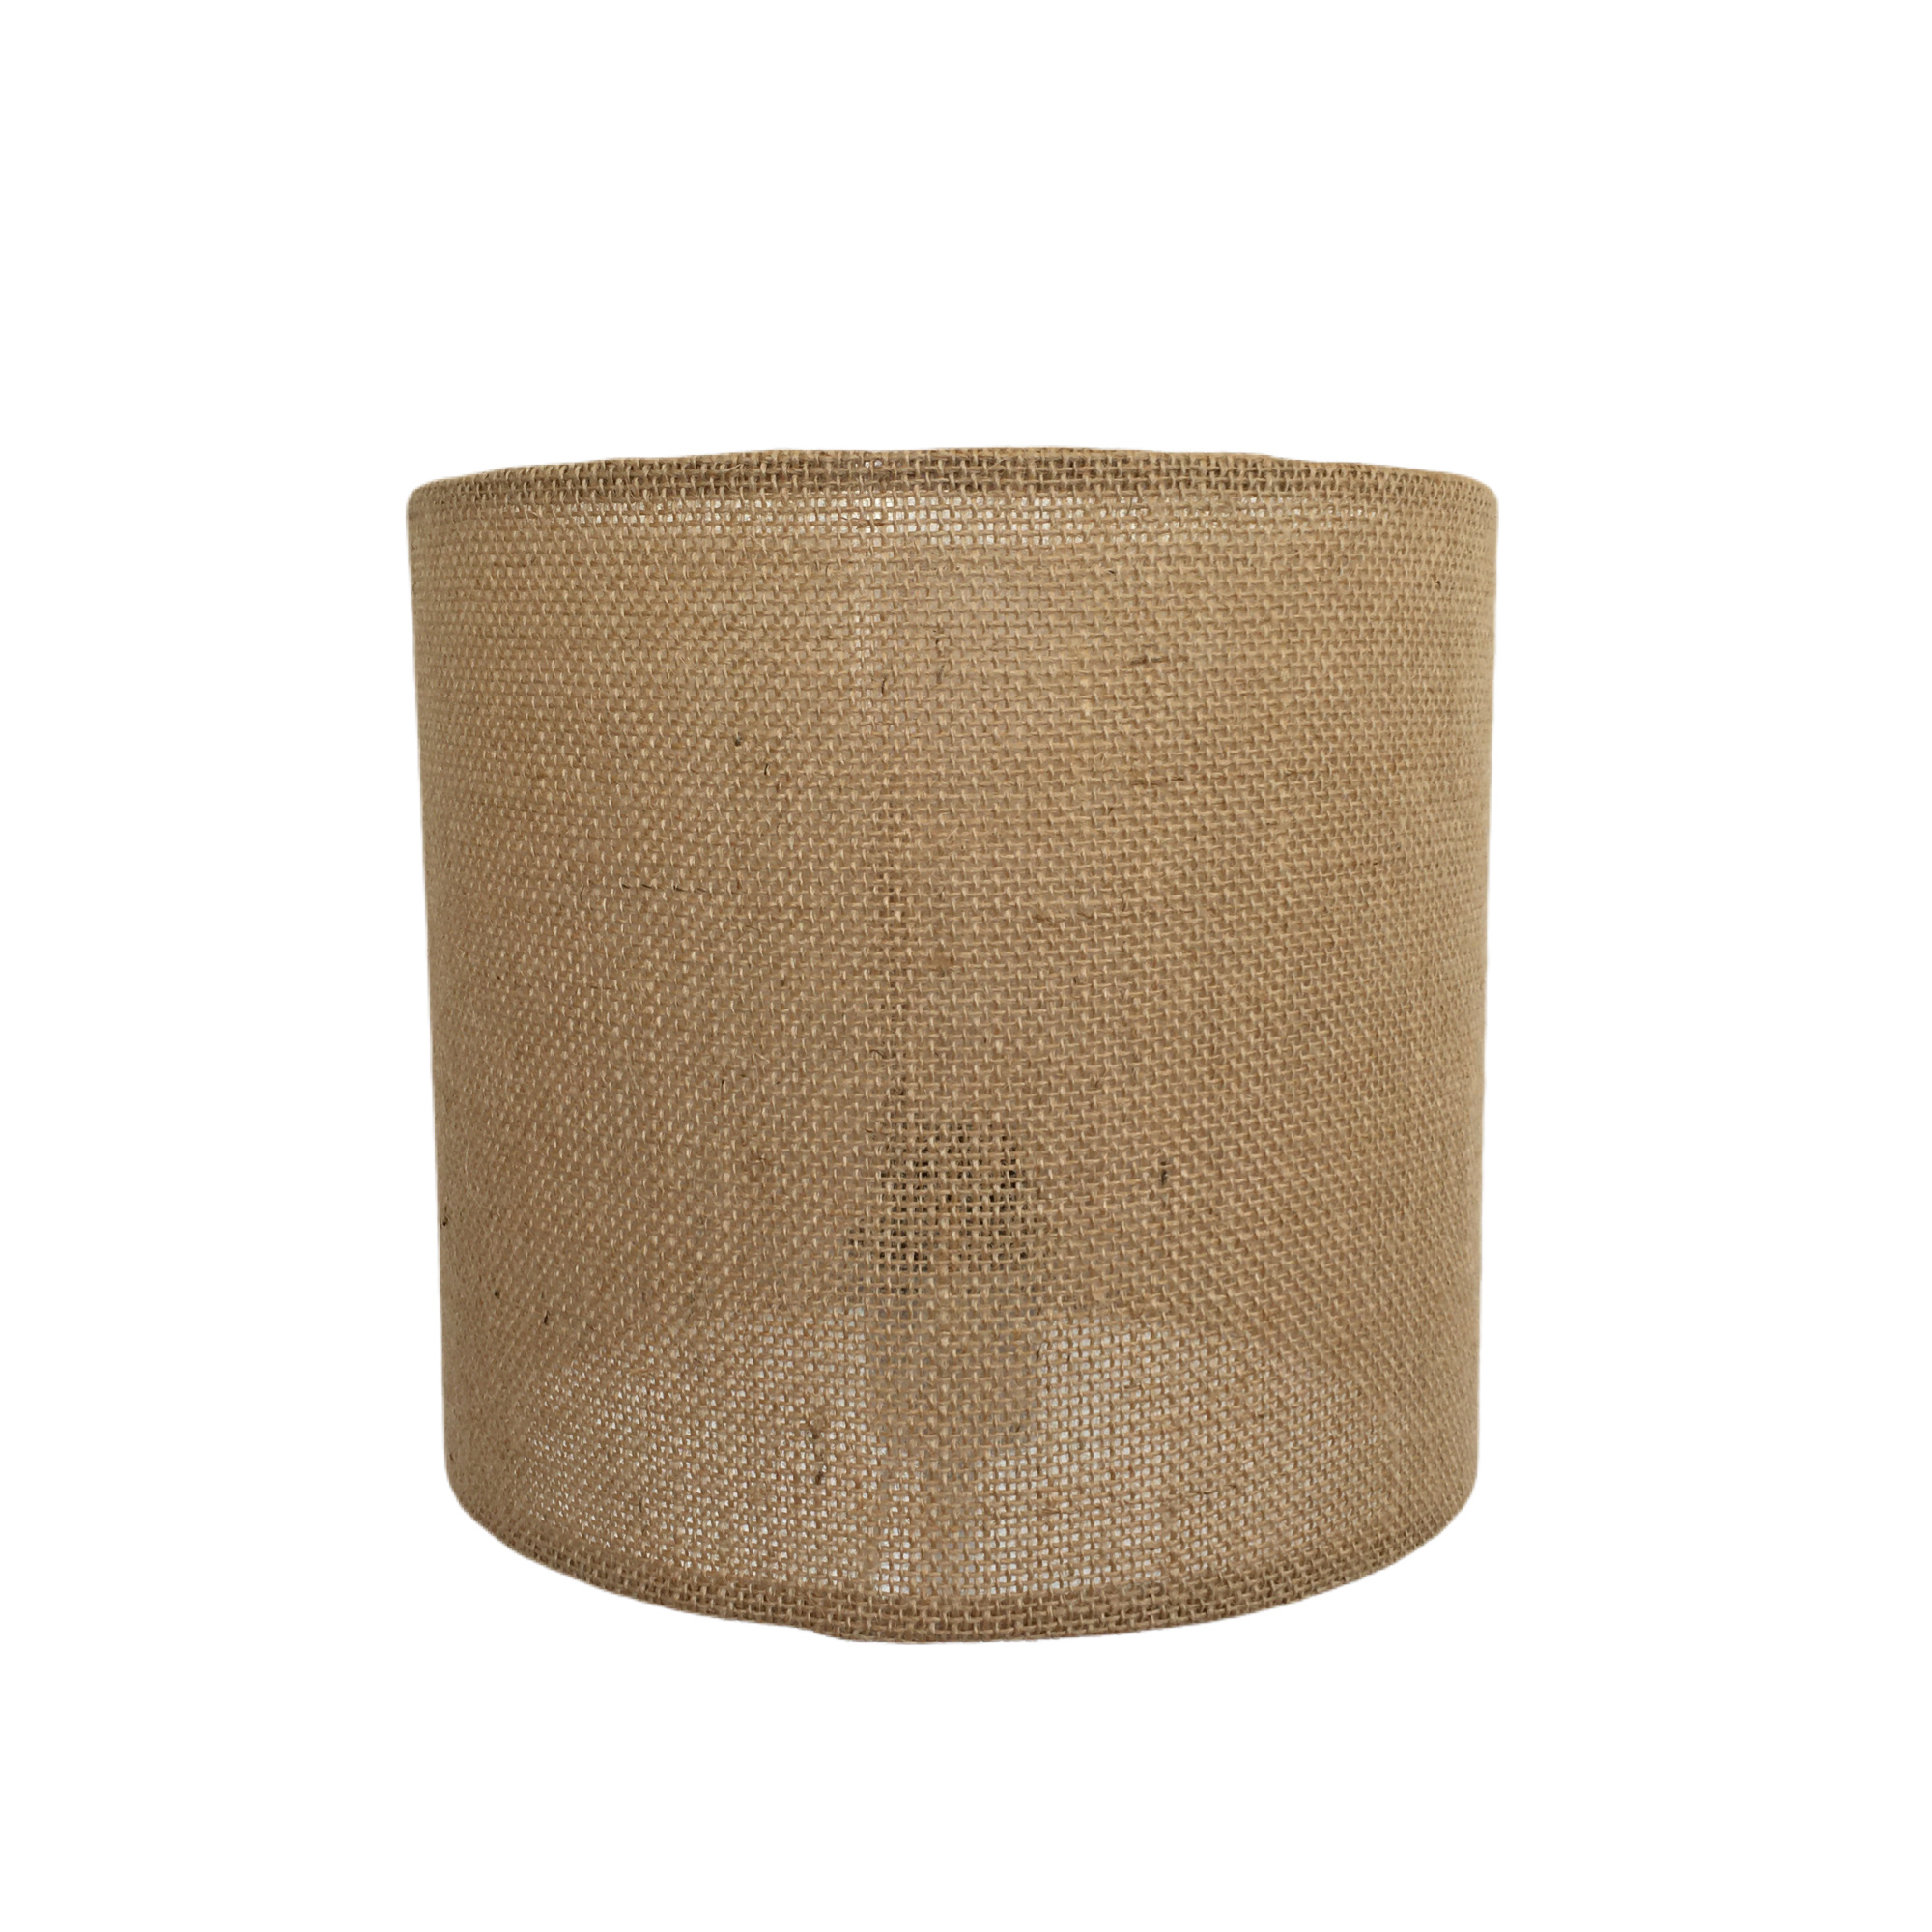 Suspension toile de jute diamètre 45 cm